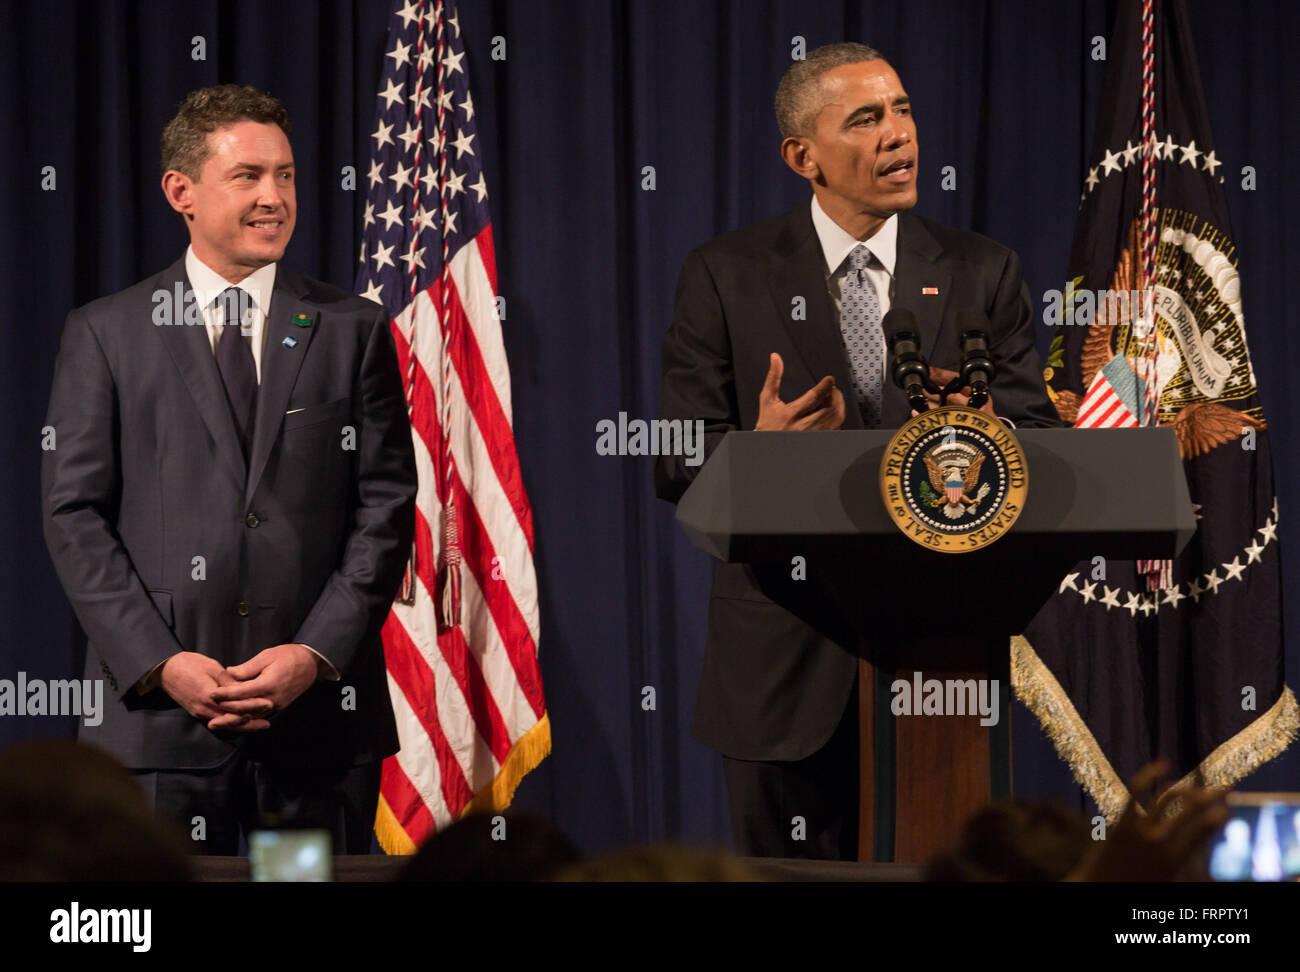 Buenos Aires, Argentina. 23rd Mar, 2016. American ambassador Noah Mamet hosts President Barack Obama in Buenos Aires, - Stock Image